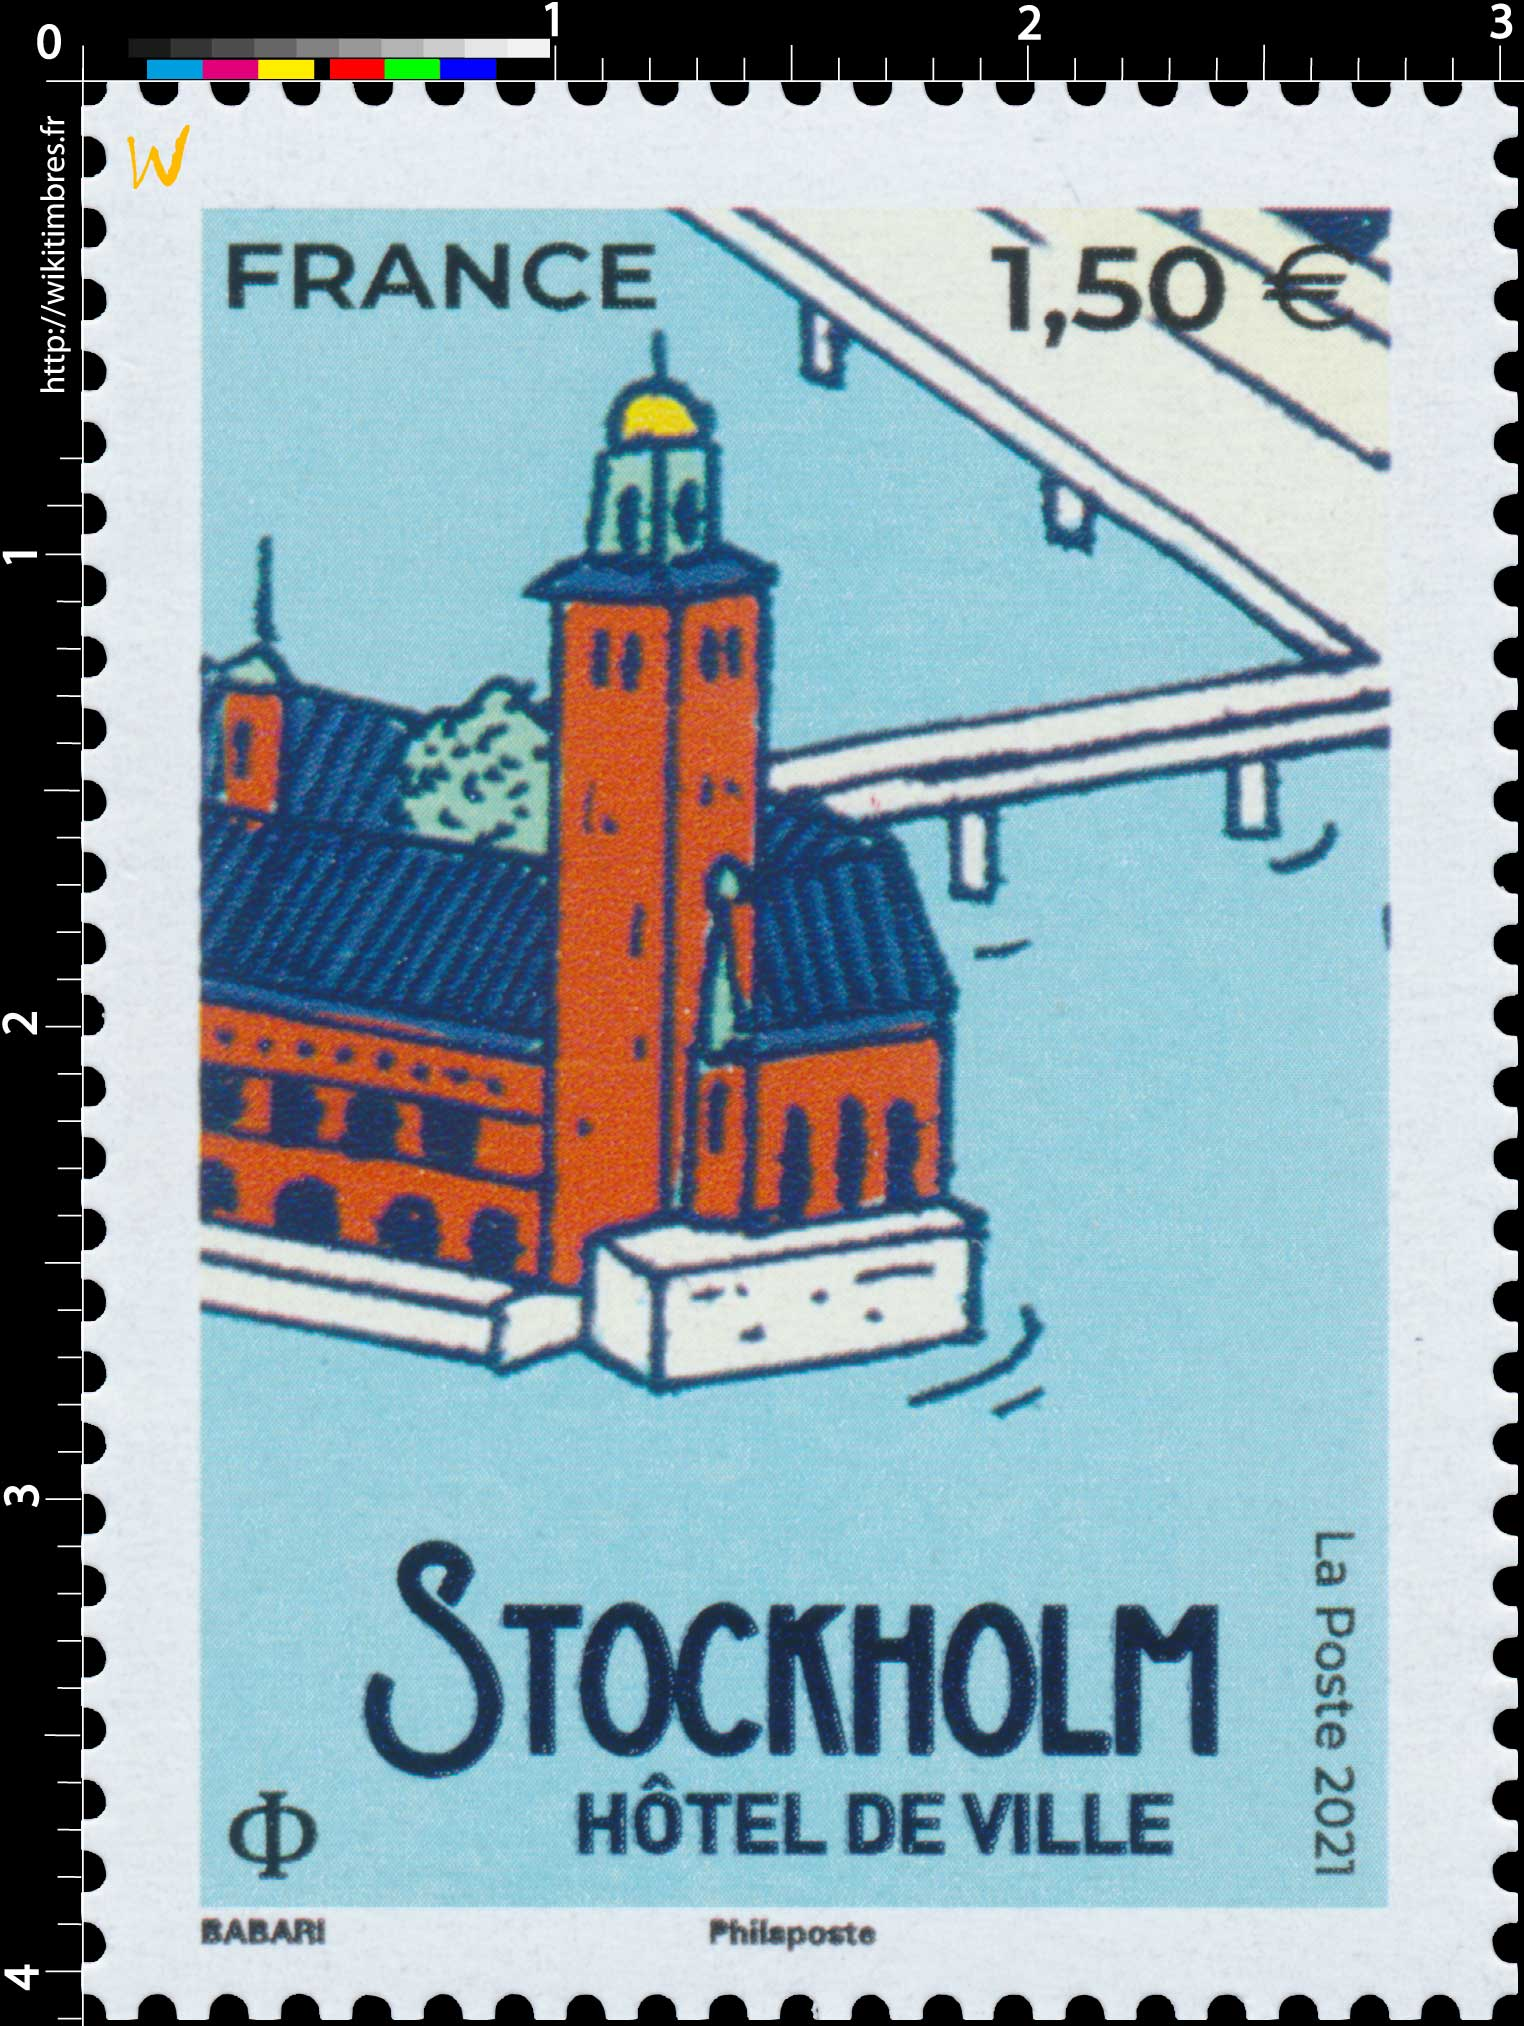 2021 STOCKHOLM - Hôtel de ville